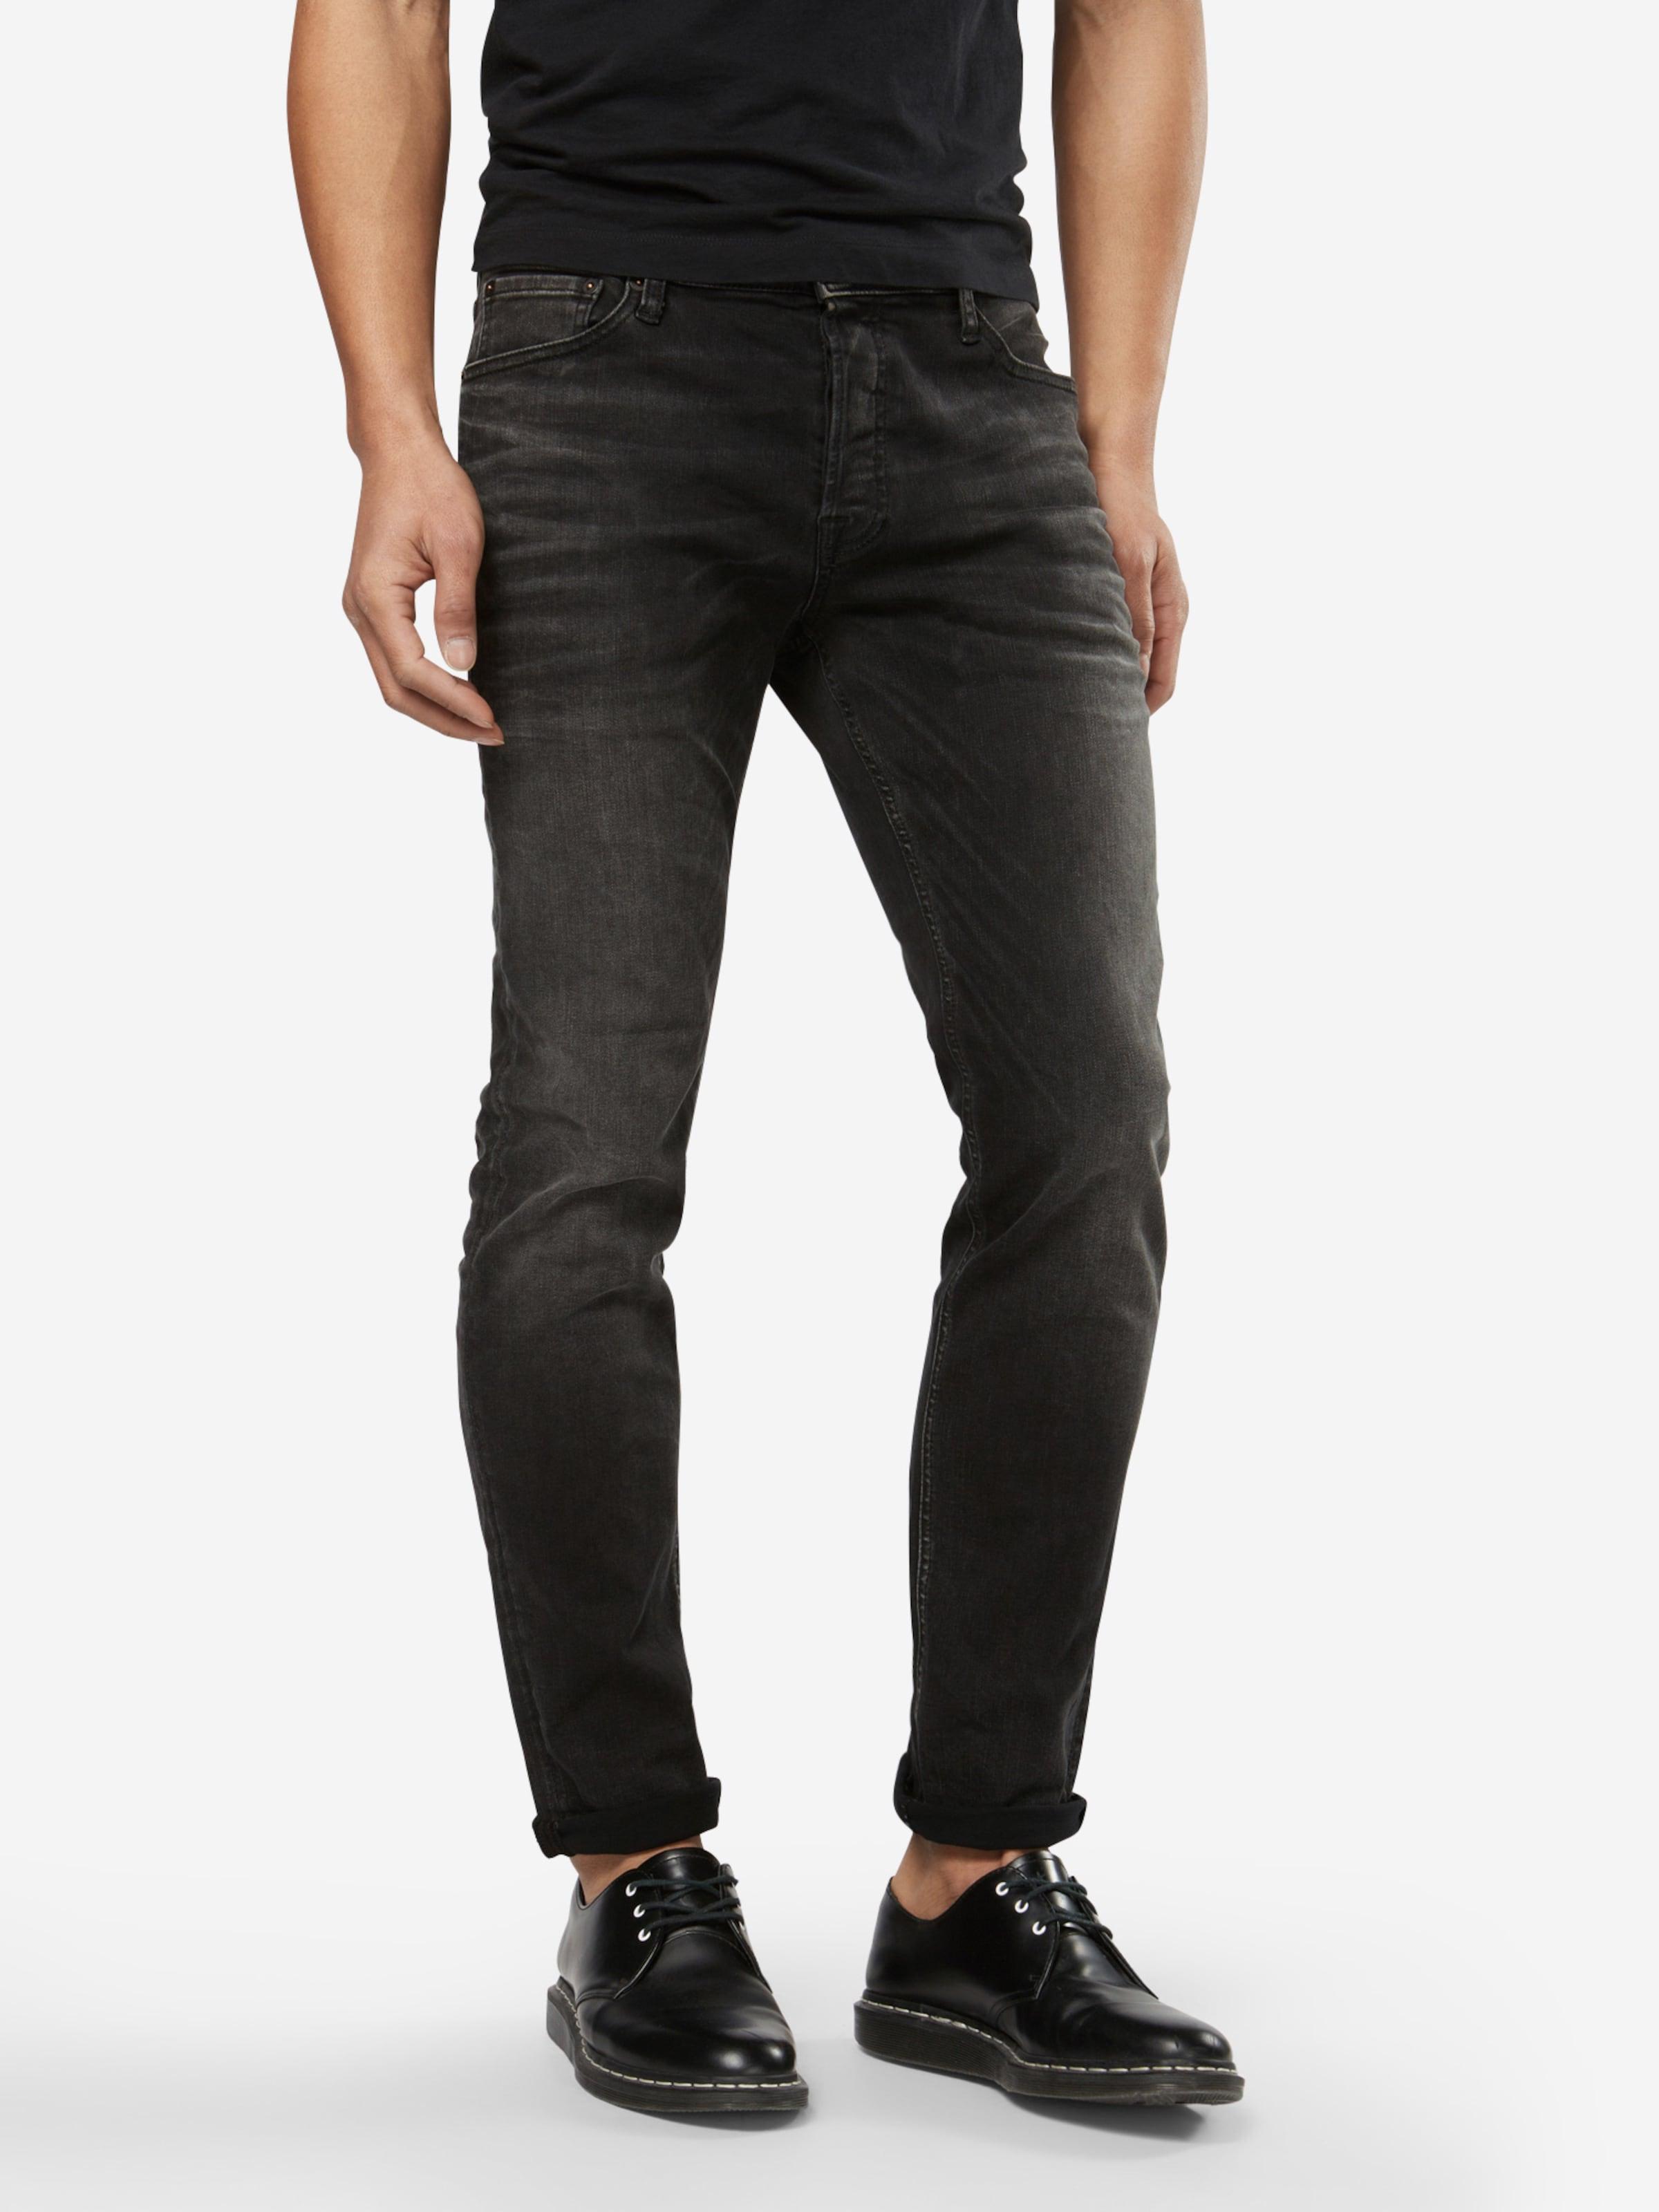 JACK & JONES Jeans 'JJITIM JJORIGINAL JOS 709 NOOS' Empfehlen Rabatt TPkvrvPAd